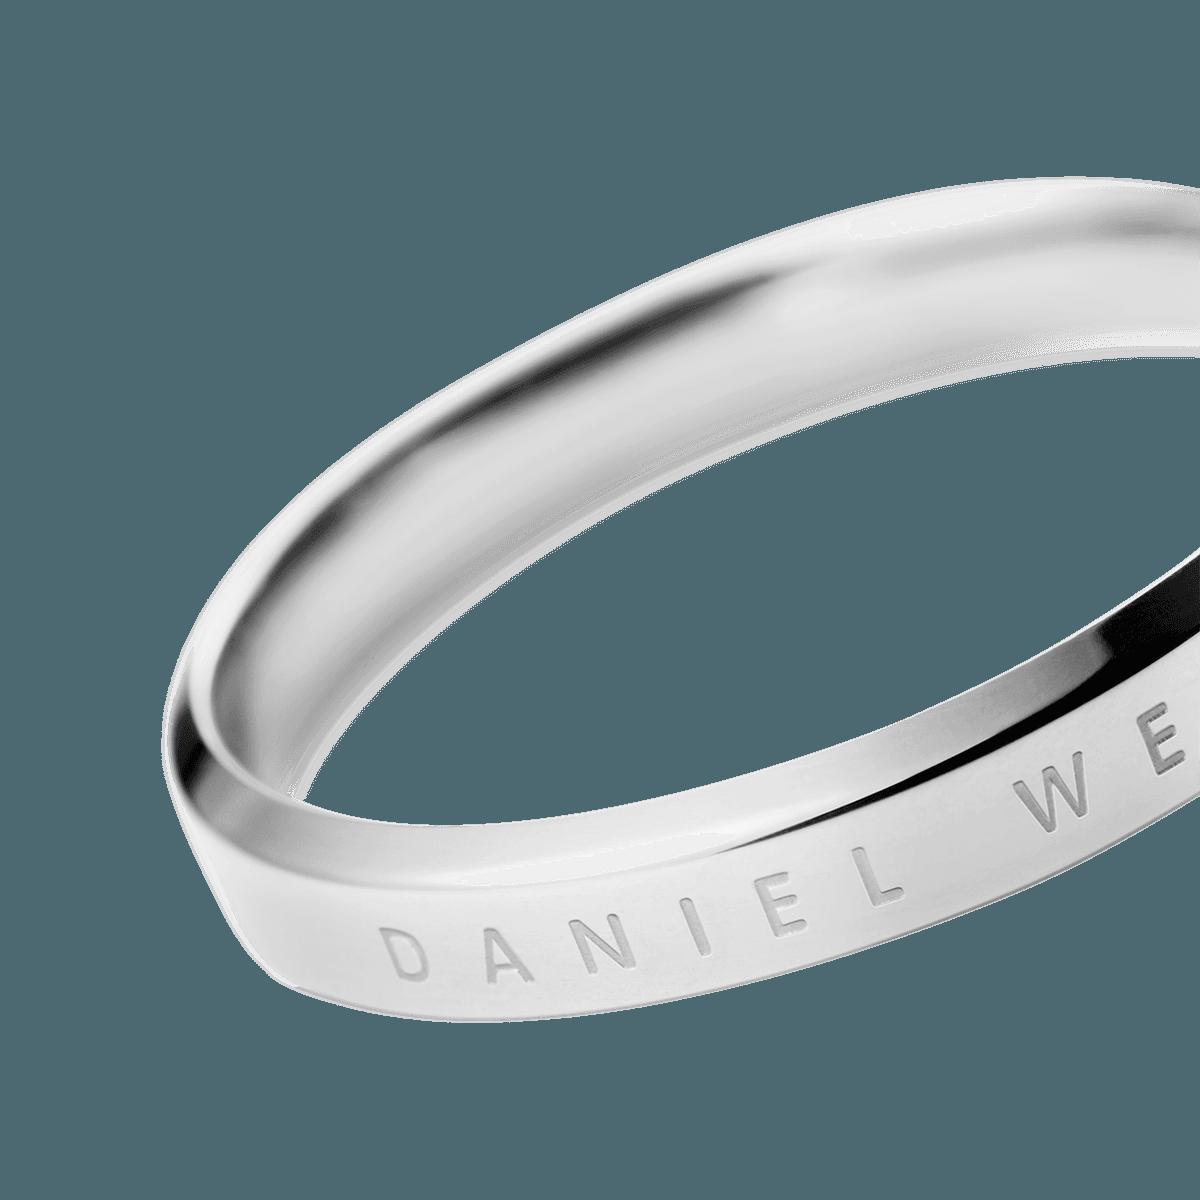 dw官网 dw手表官网 dw中国官网 dw官方旗舰店 DW DW官网  Classic Ring Silver 60mm